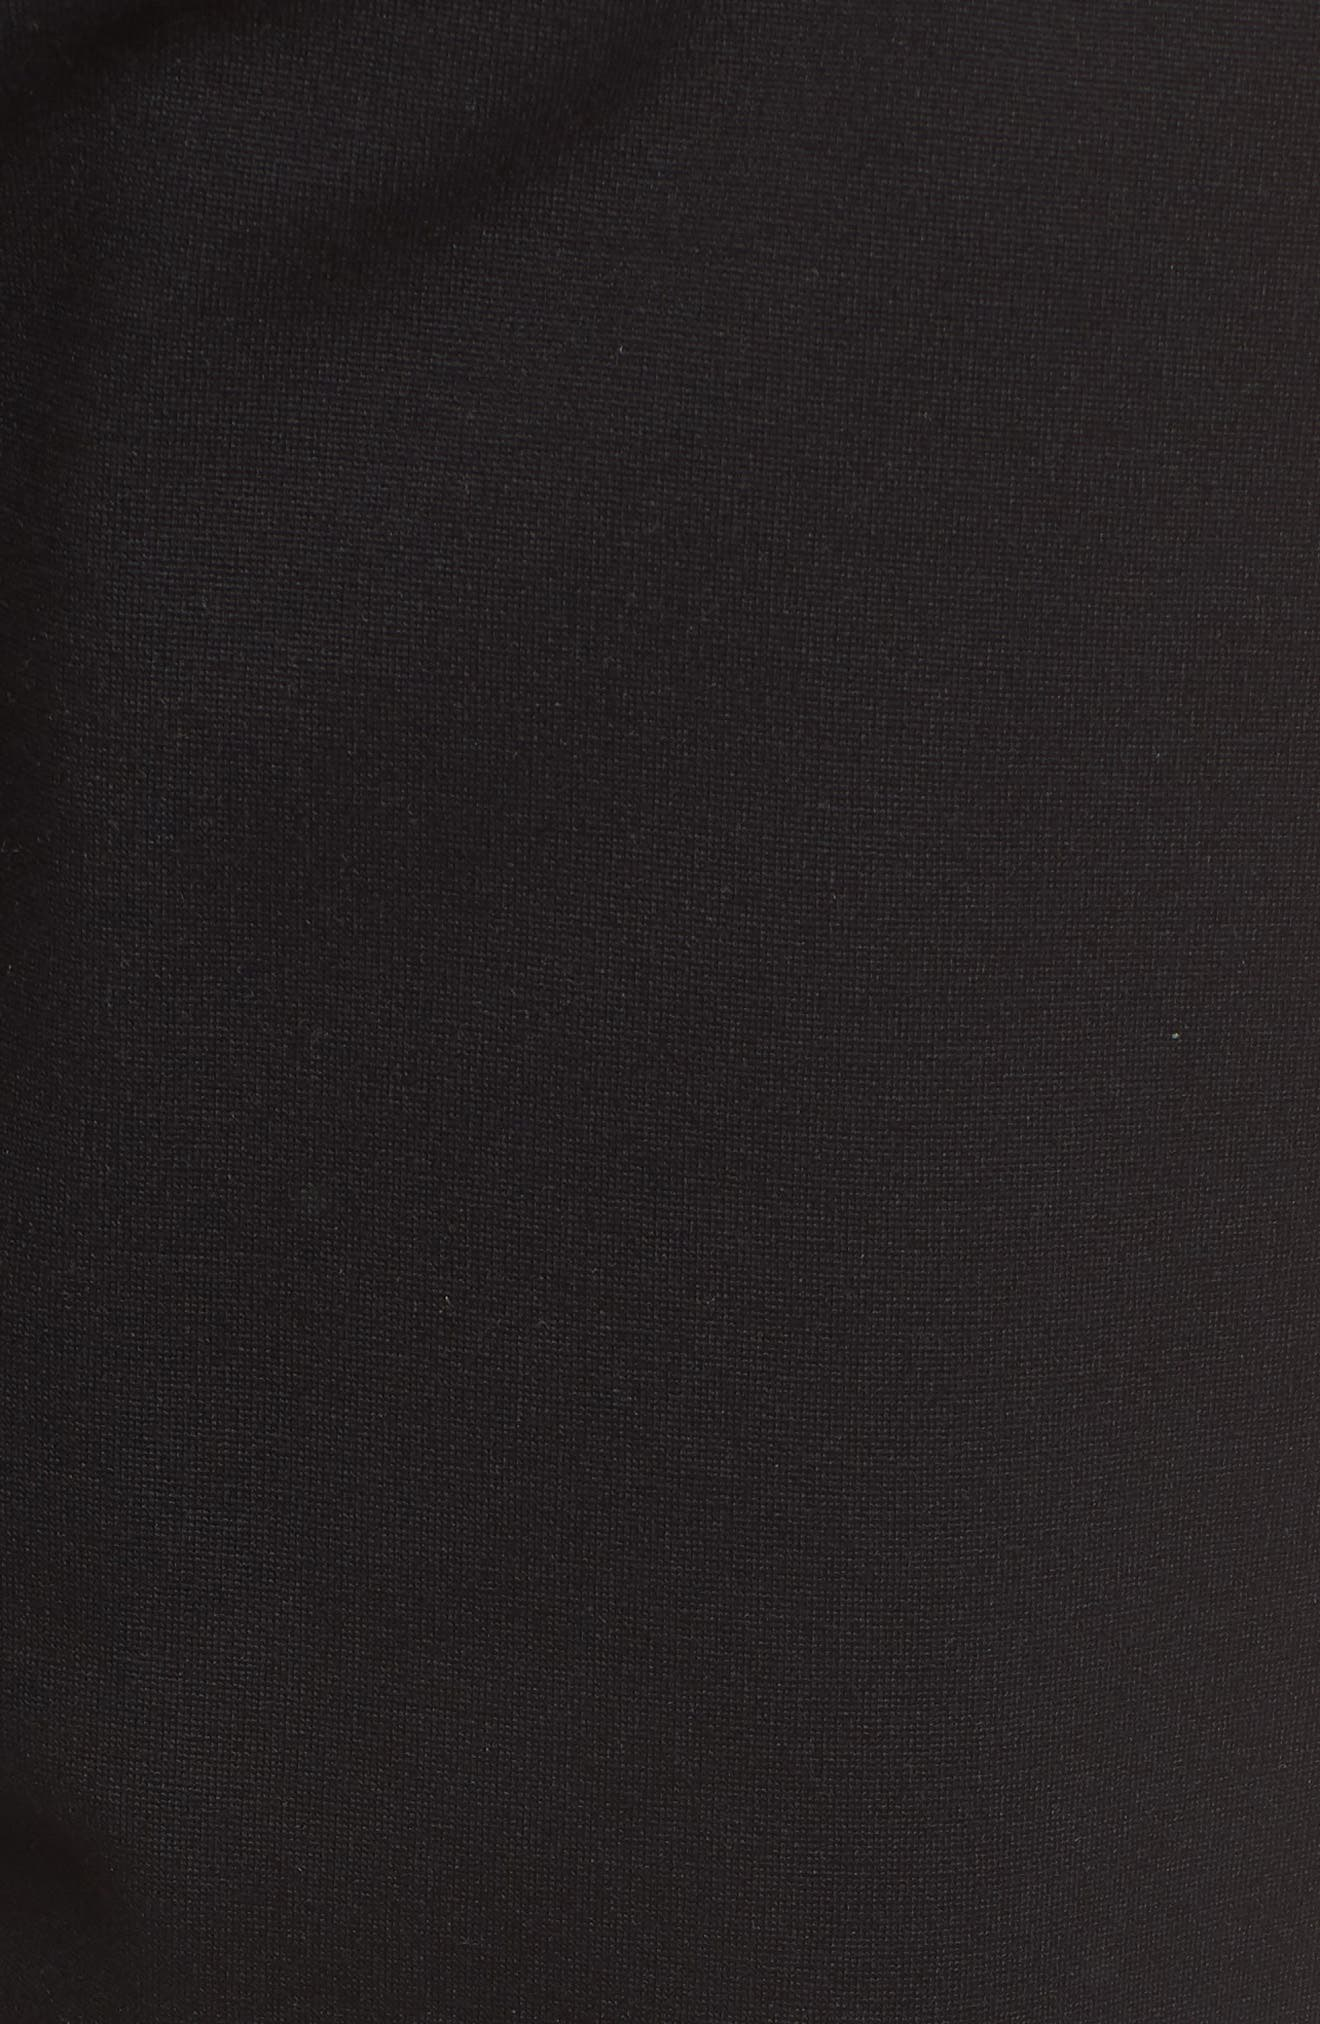 Maxine Contrast Maternity Pants,                             Alternate thumbnail 5, color,                             Caviar Black